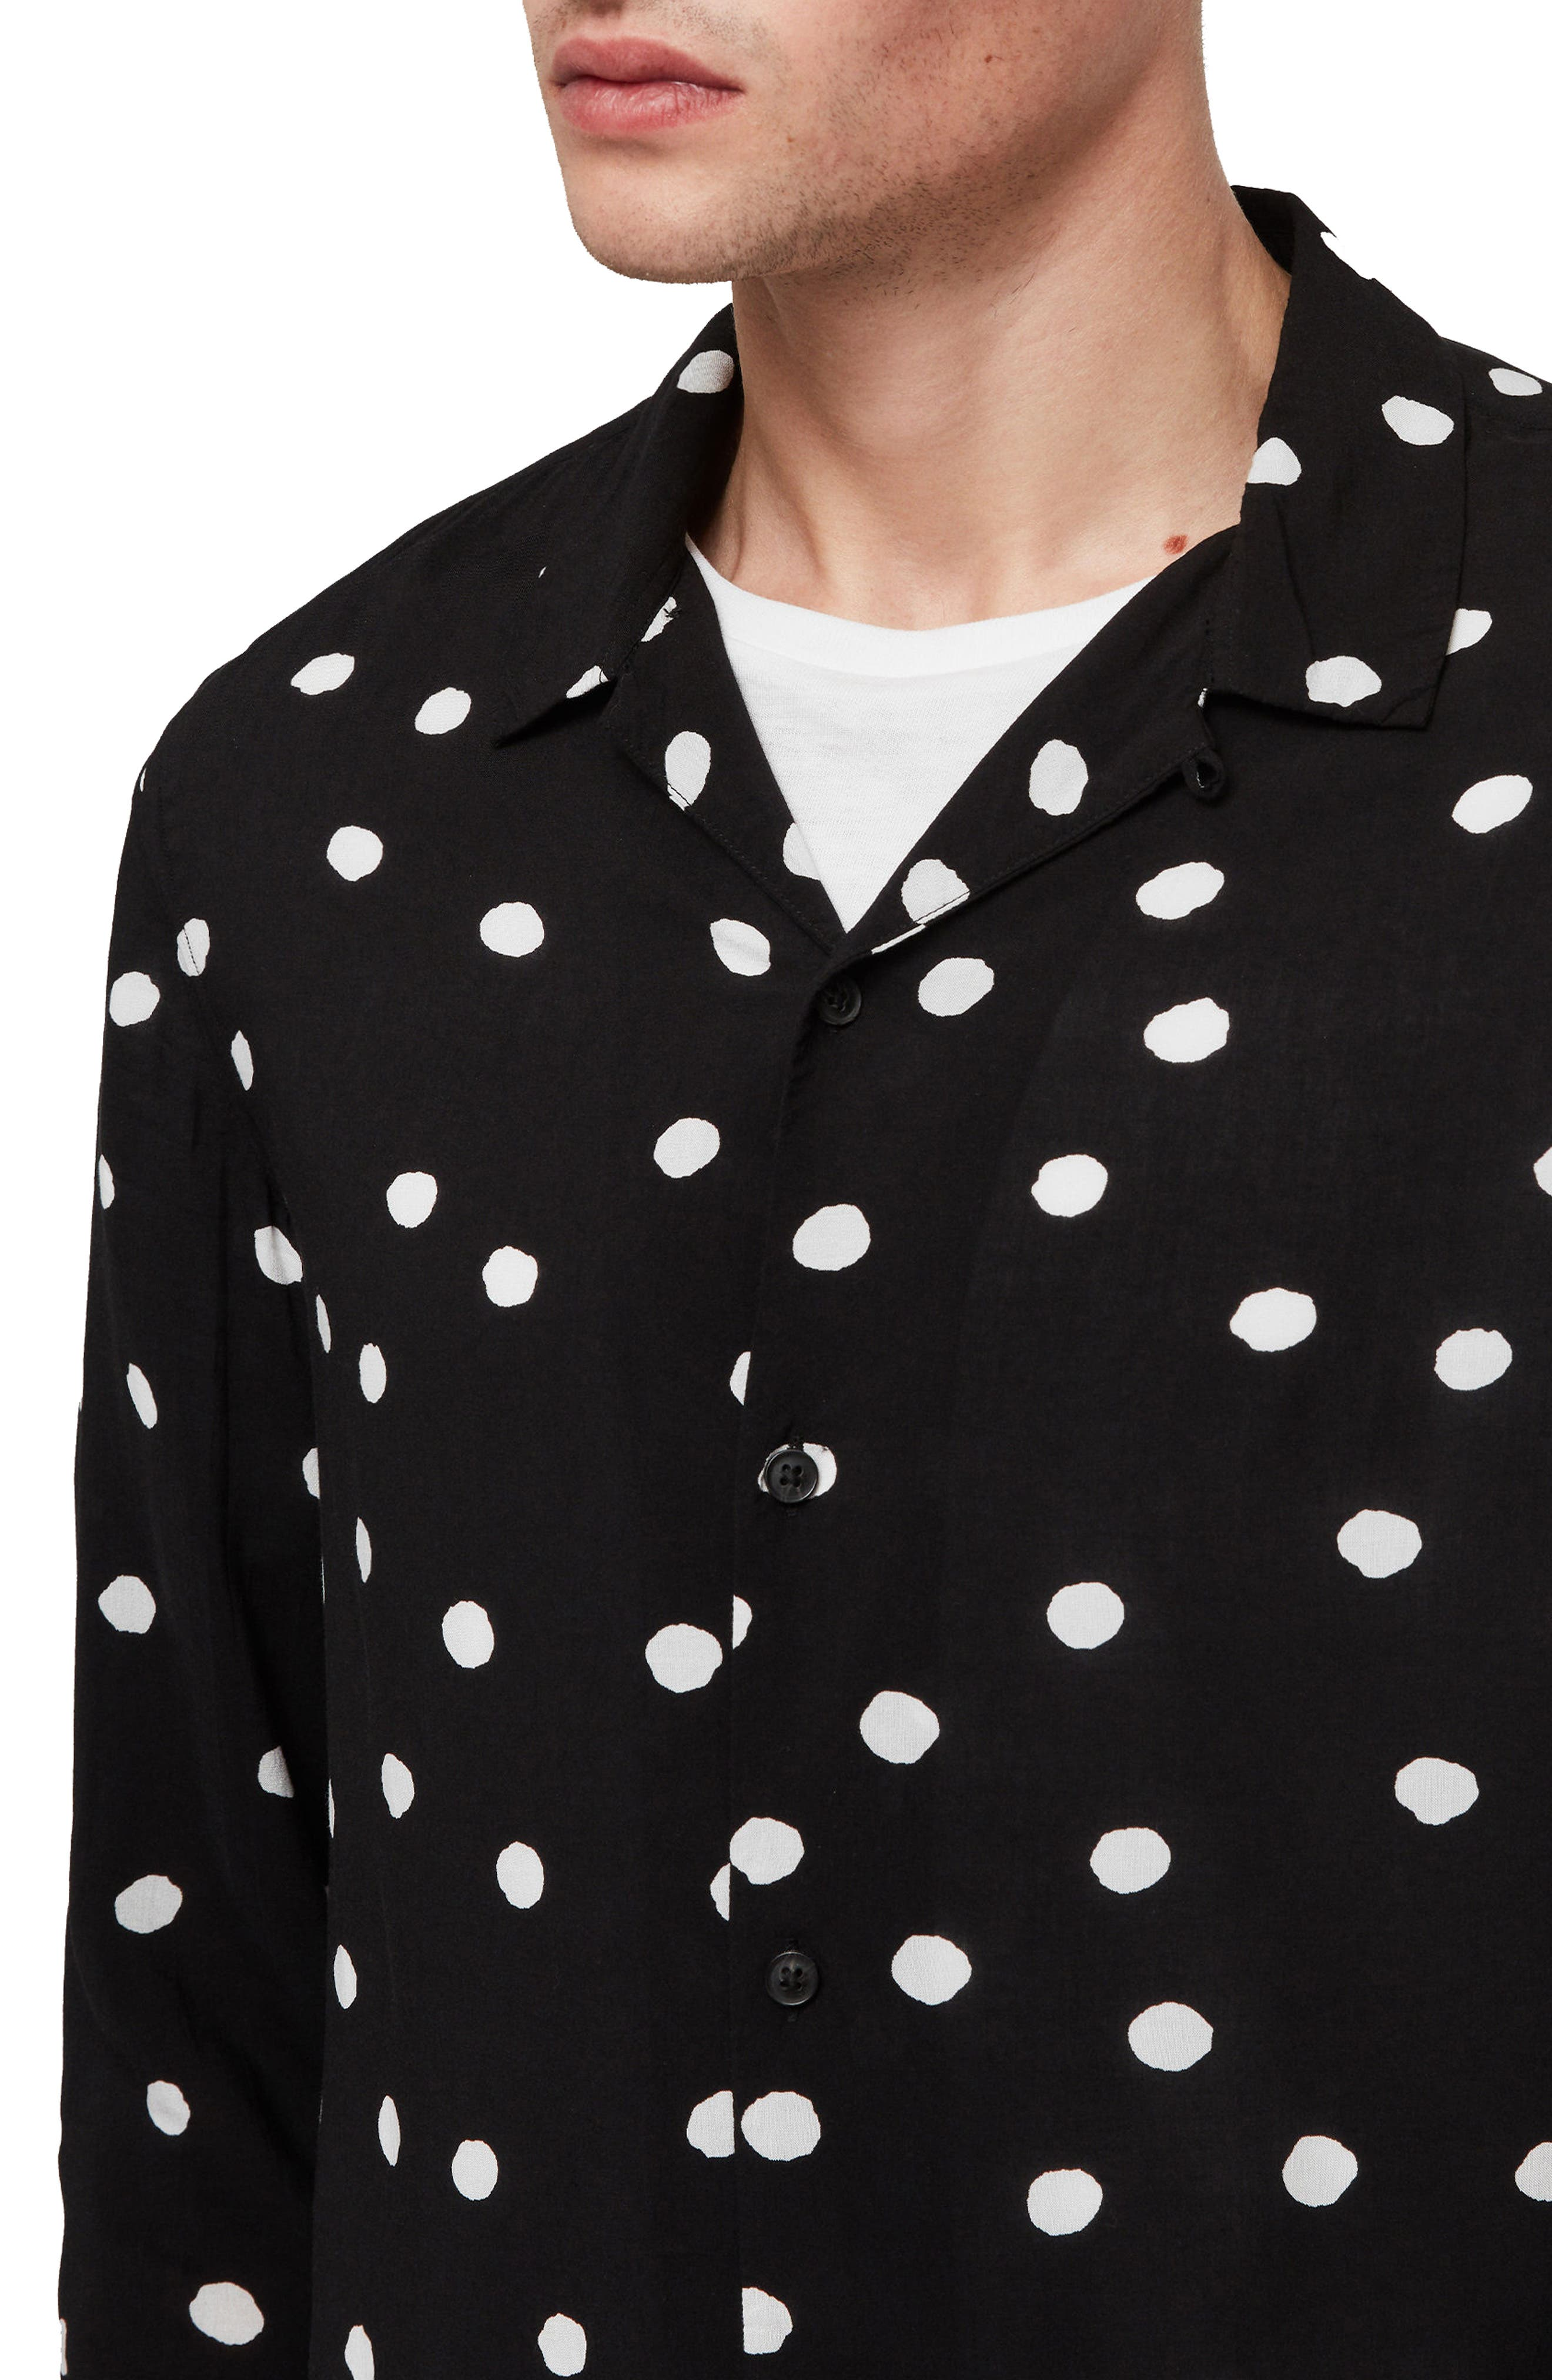 ALLSAINTS, Pozere Polka Dot Sport Shirt, Alternate thumbnail 2, color, 001